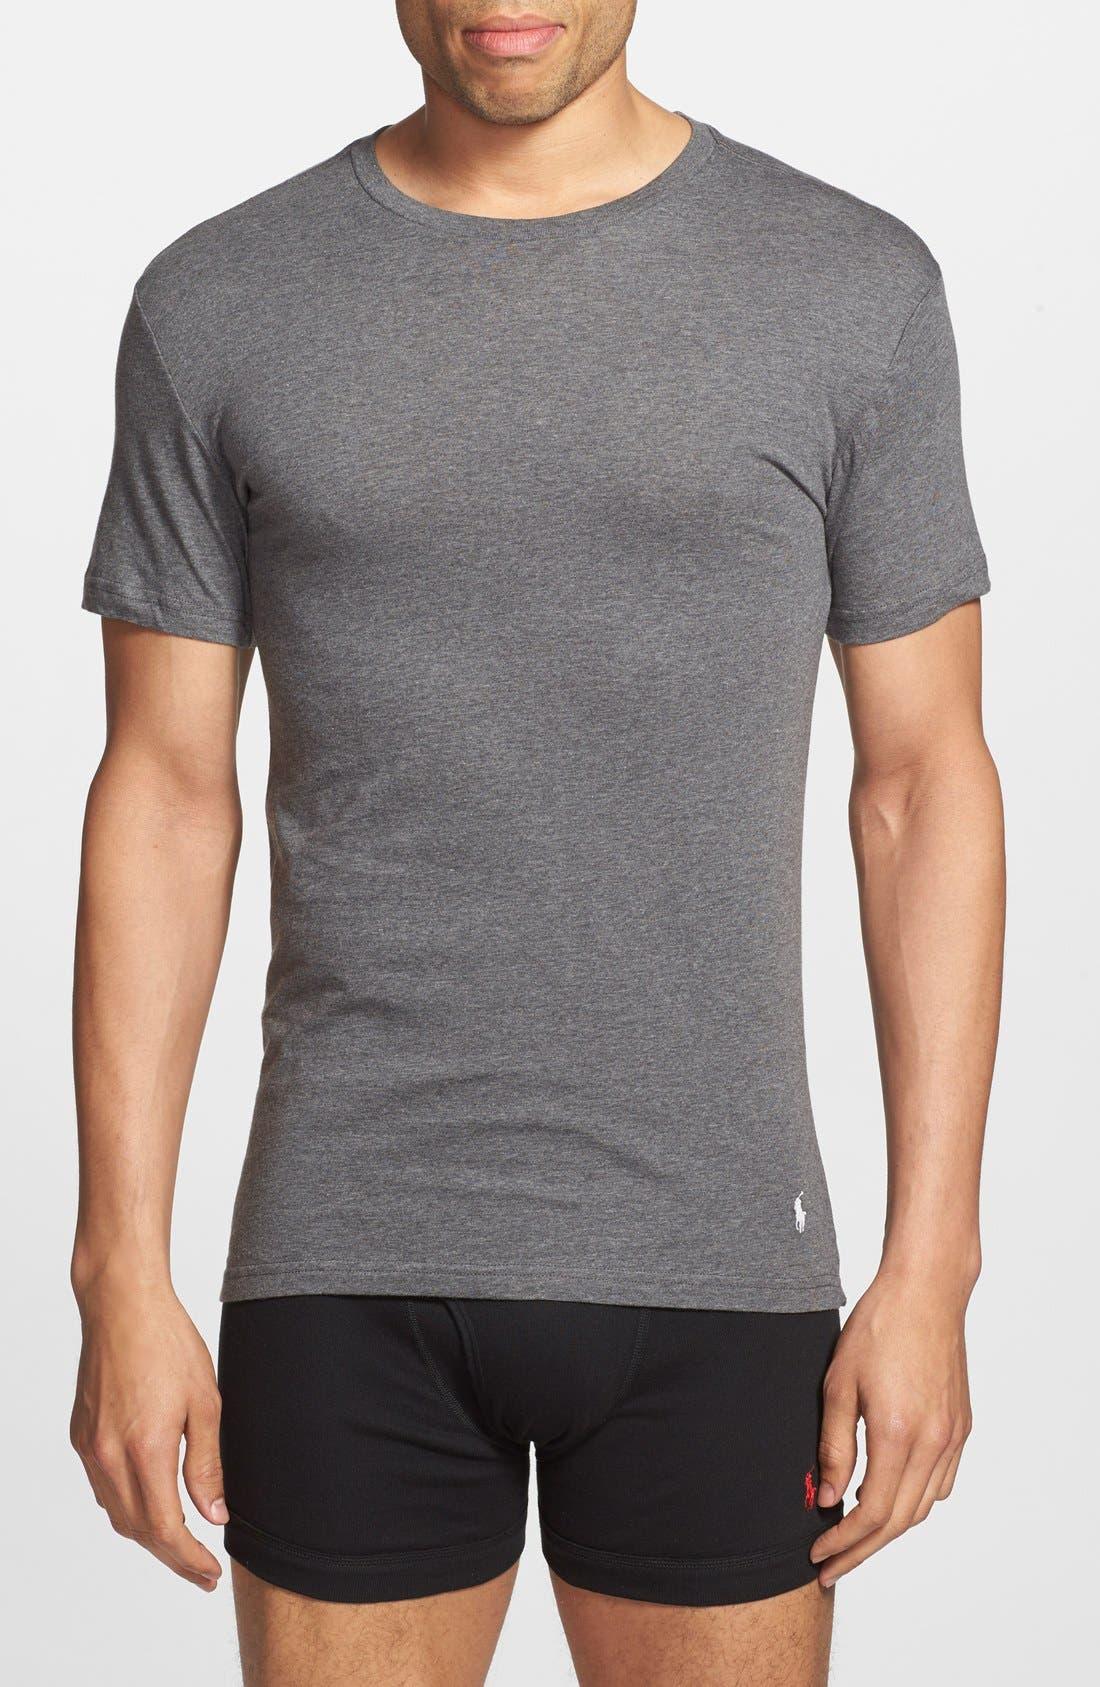 Main Image - Polo Ralph Lauren 3-Pack Slim Fit T-Shirt